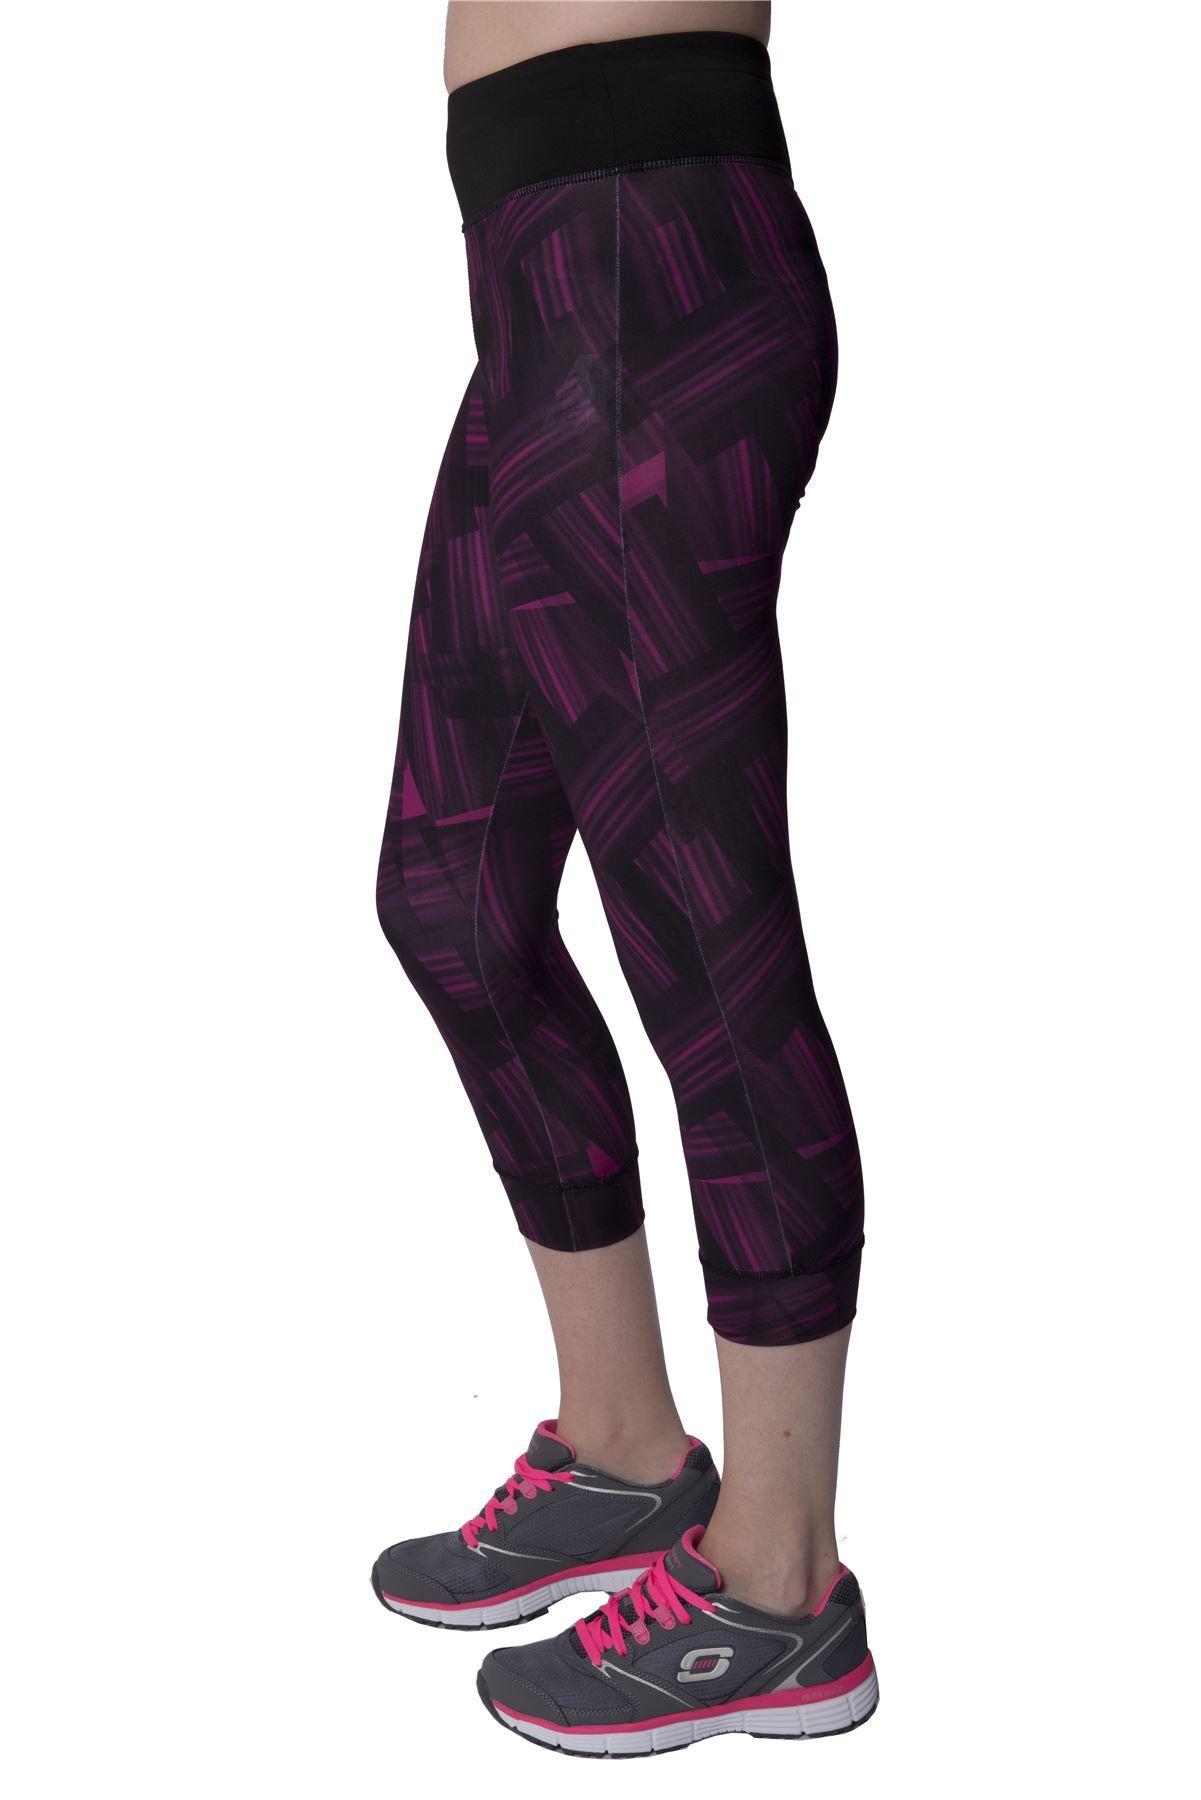 skechers womens gym sports leggings 3 4 pants ladies yoga. Black Bedroom Furniture Sets. Home Design Ideas